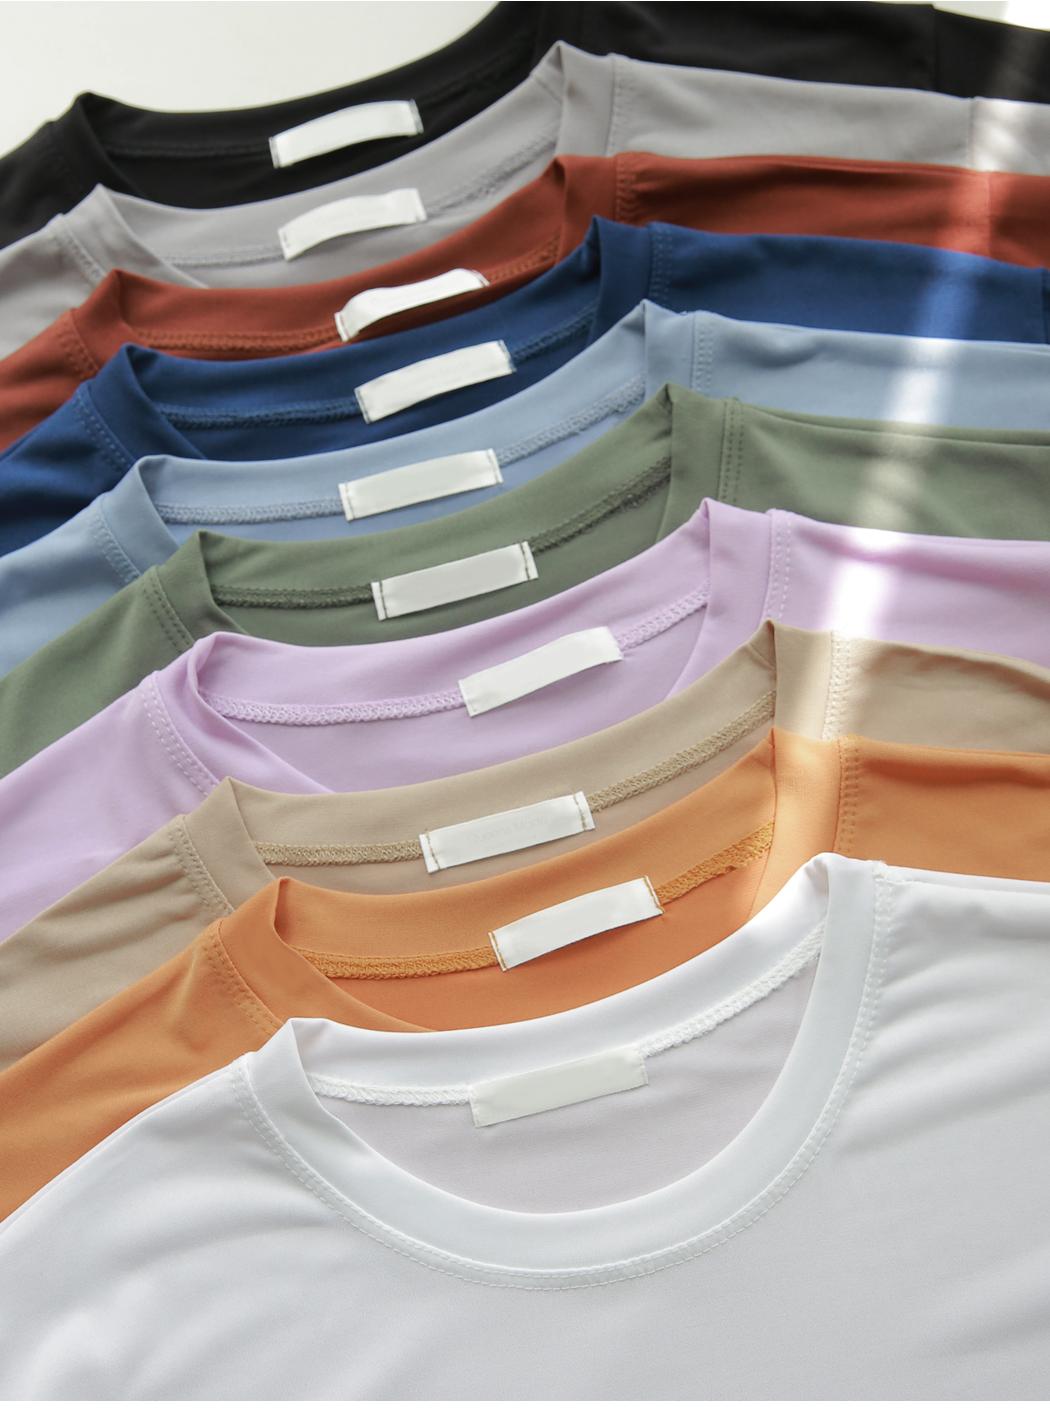 #Heat Planning Ice Round Neck Cool Short Sleeve Tee